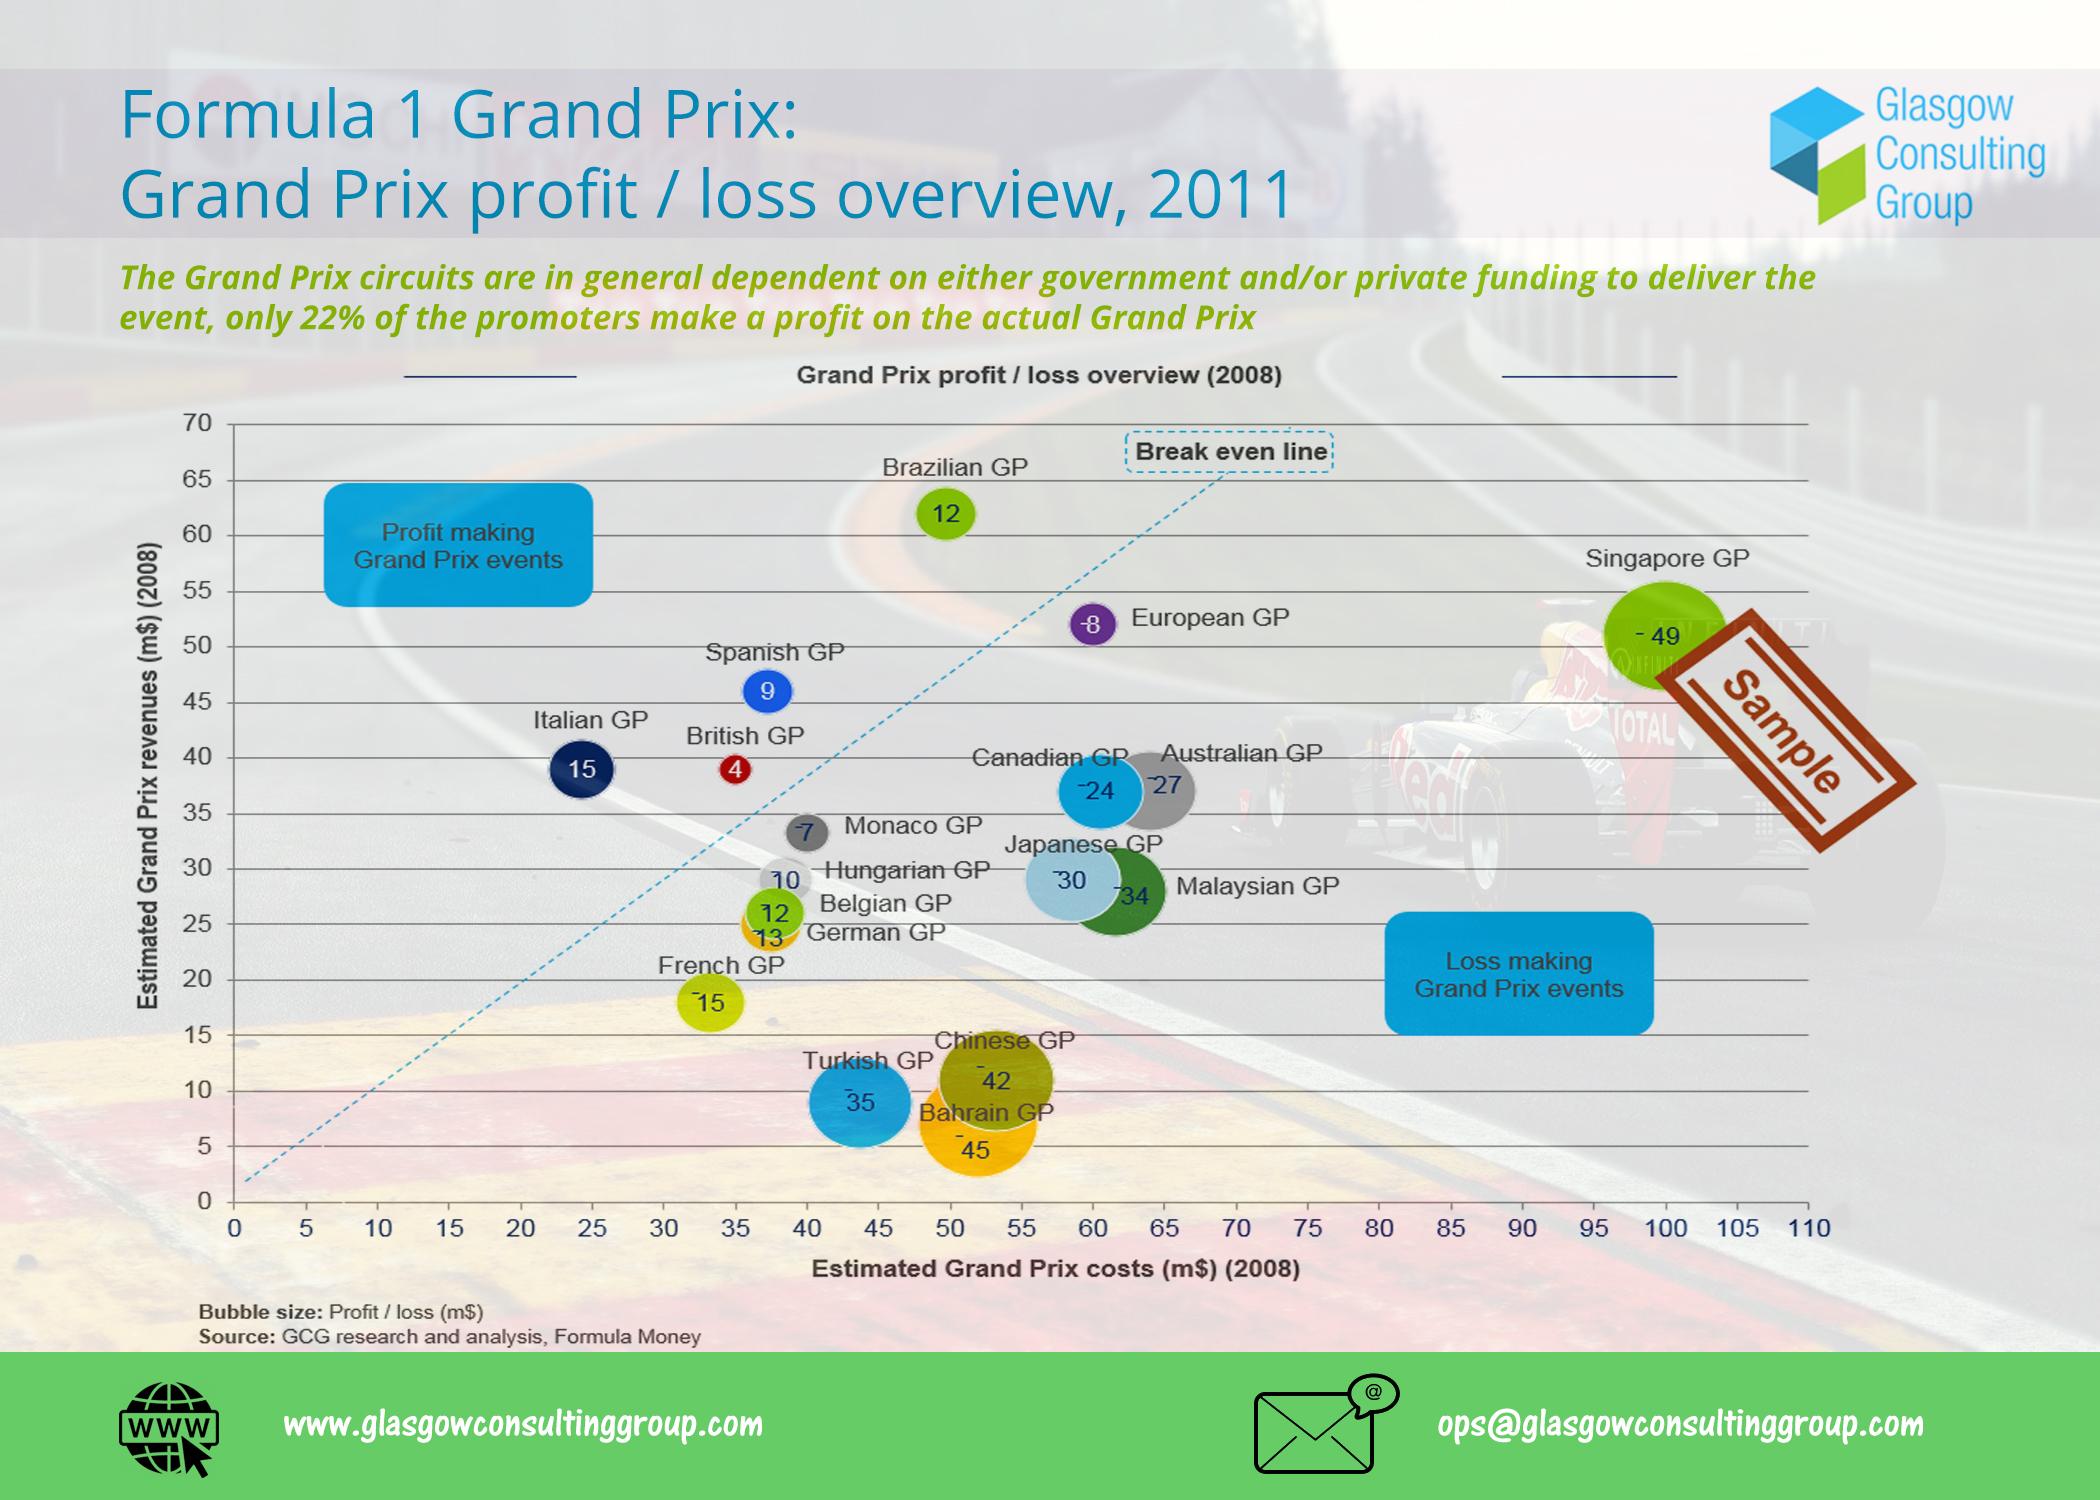 6-F1 Grand Prix Grand Prix Profit, Loss overview